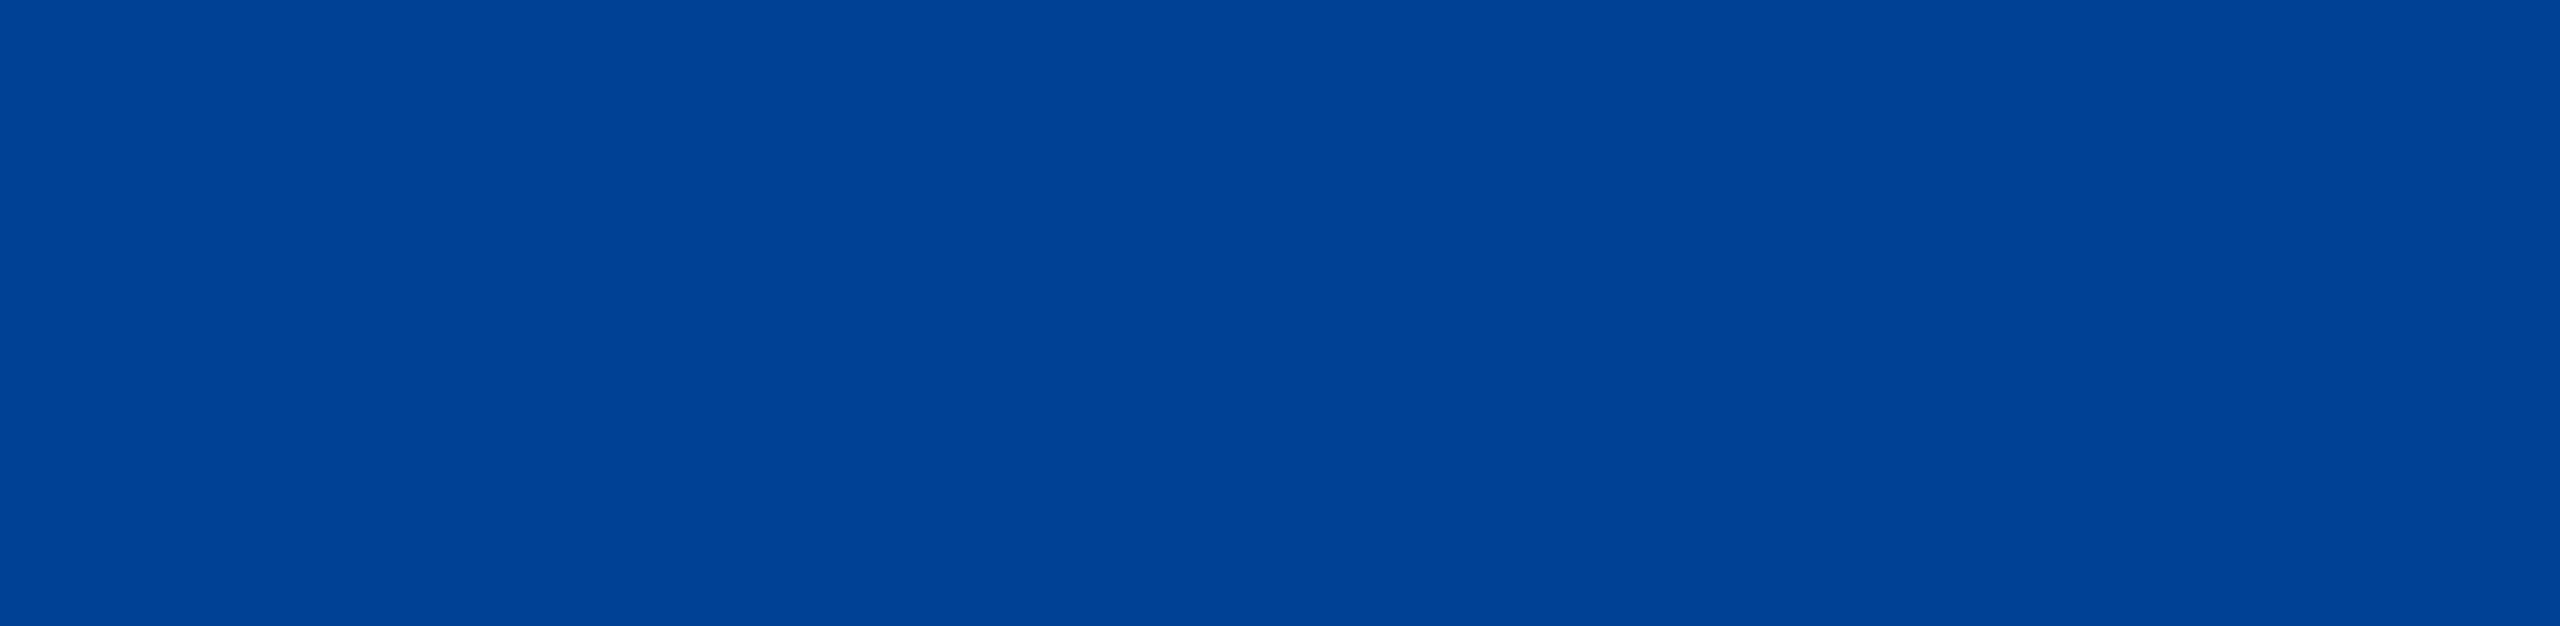 Tela imbottita blu